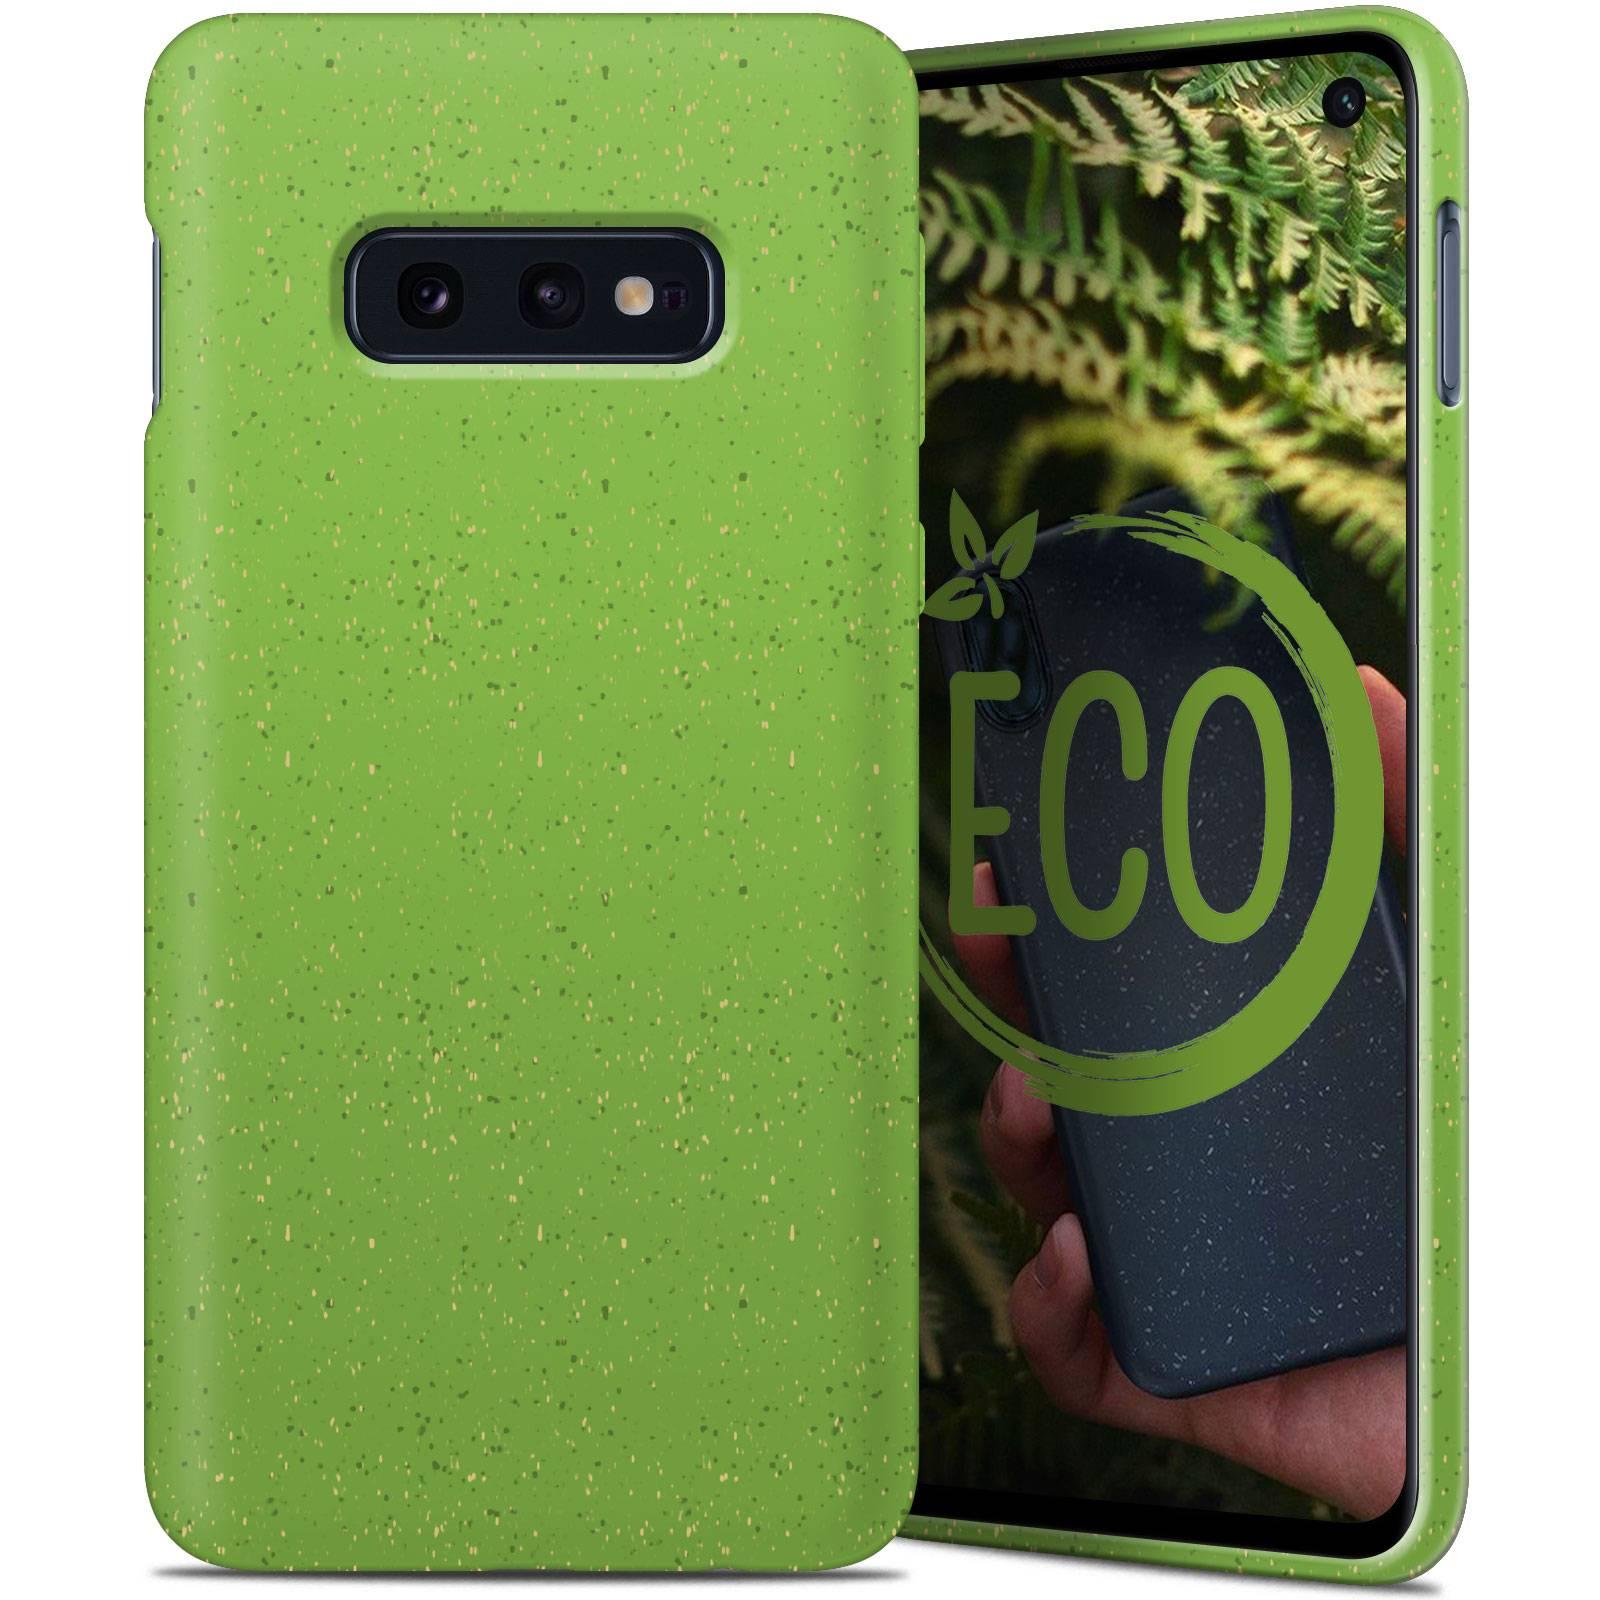 Coque Biodégradable ZERO Waste Samsung Galaxy S10e Vert